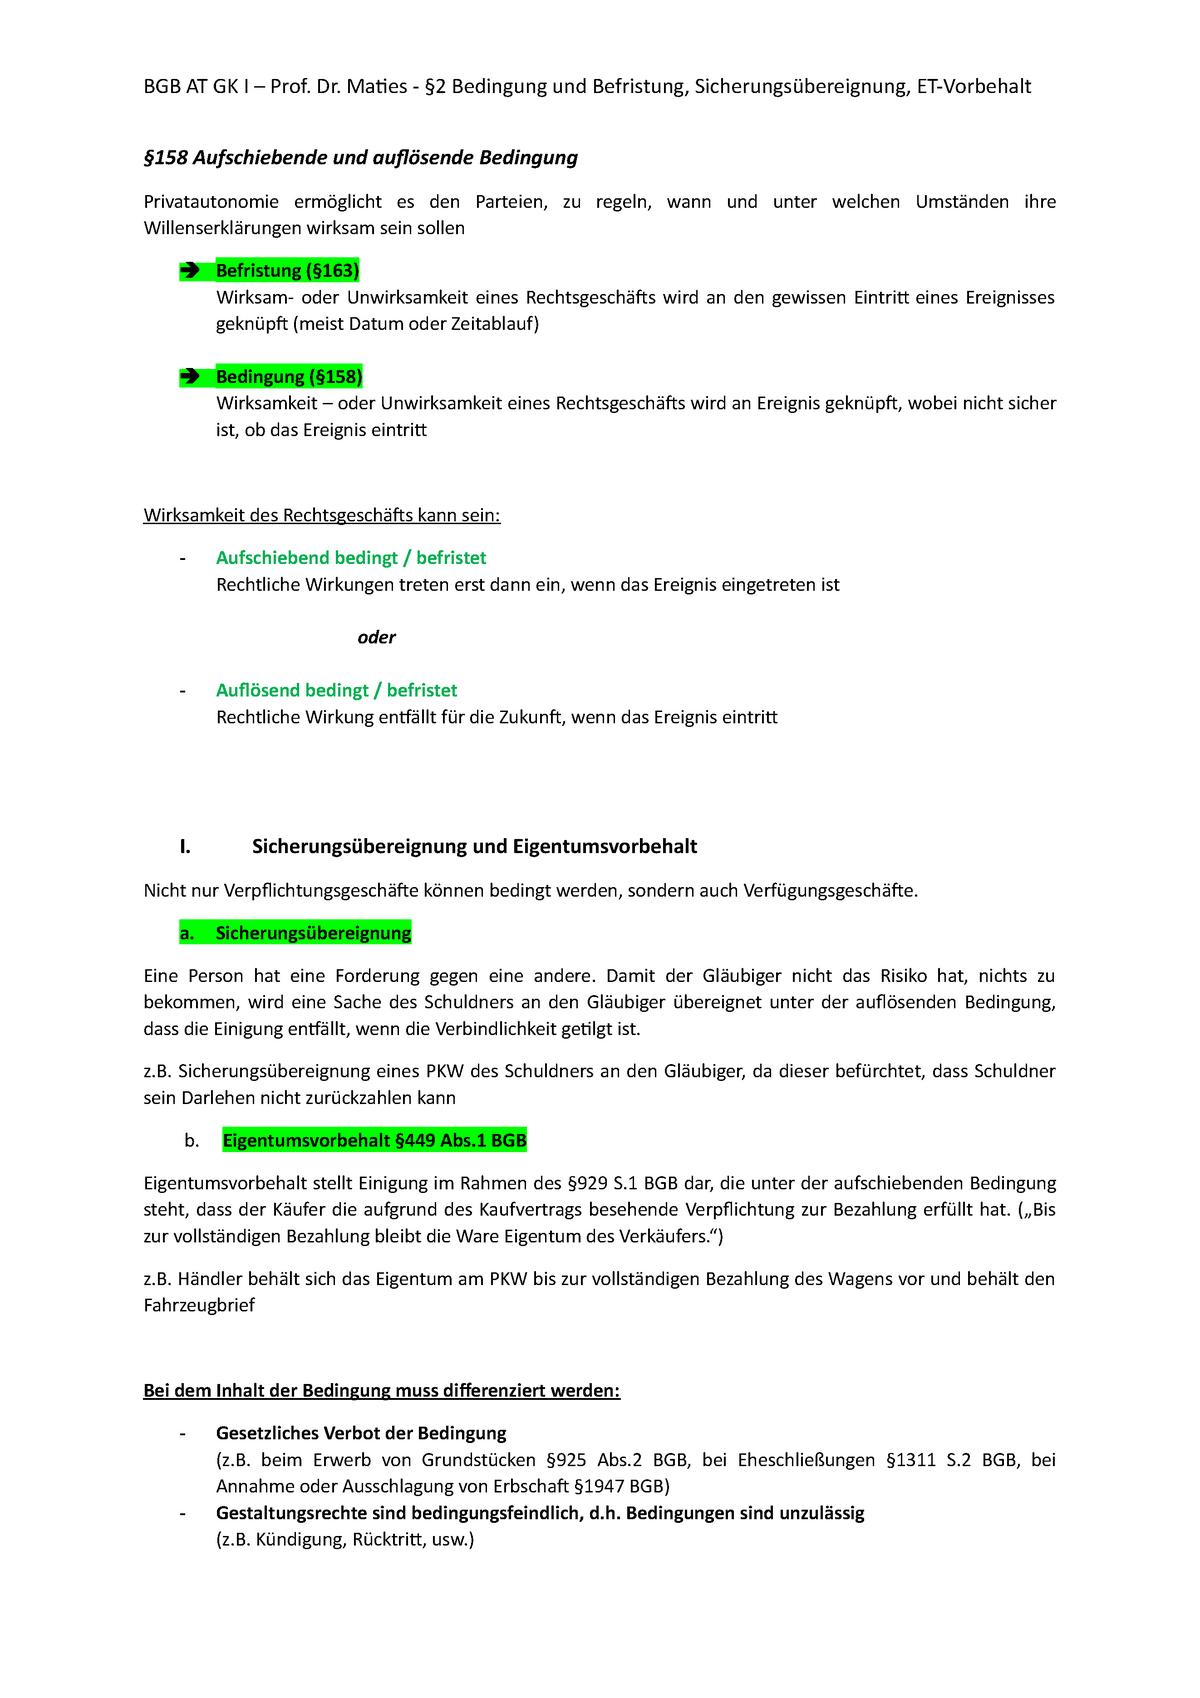 20 Bedingung und Befristung   Jura   Jura   Uni Augsburg   StuDocu